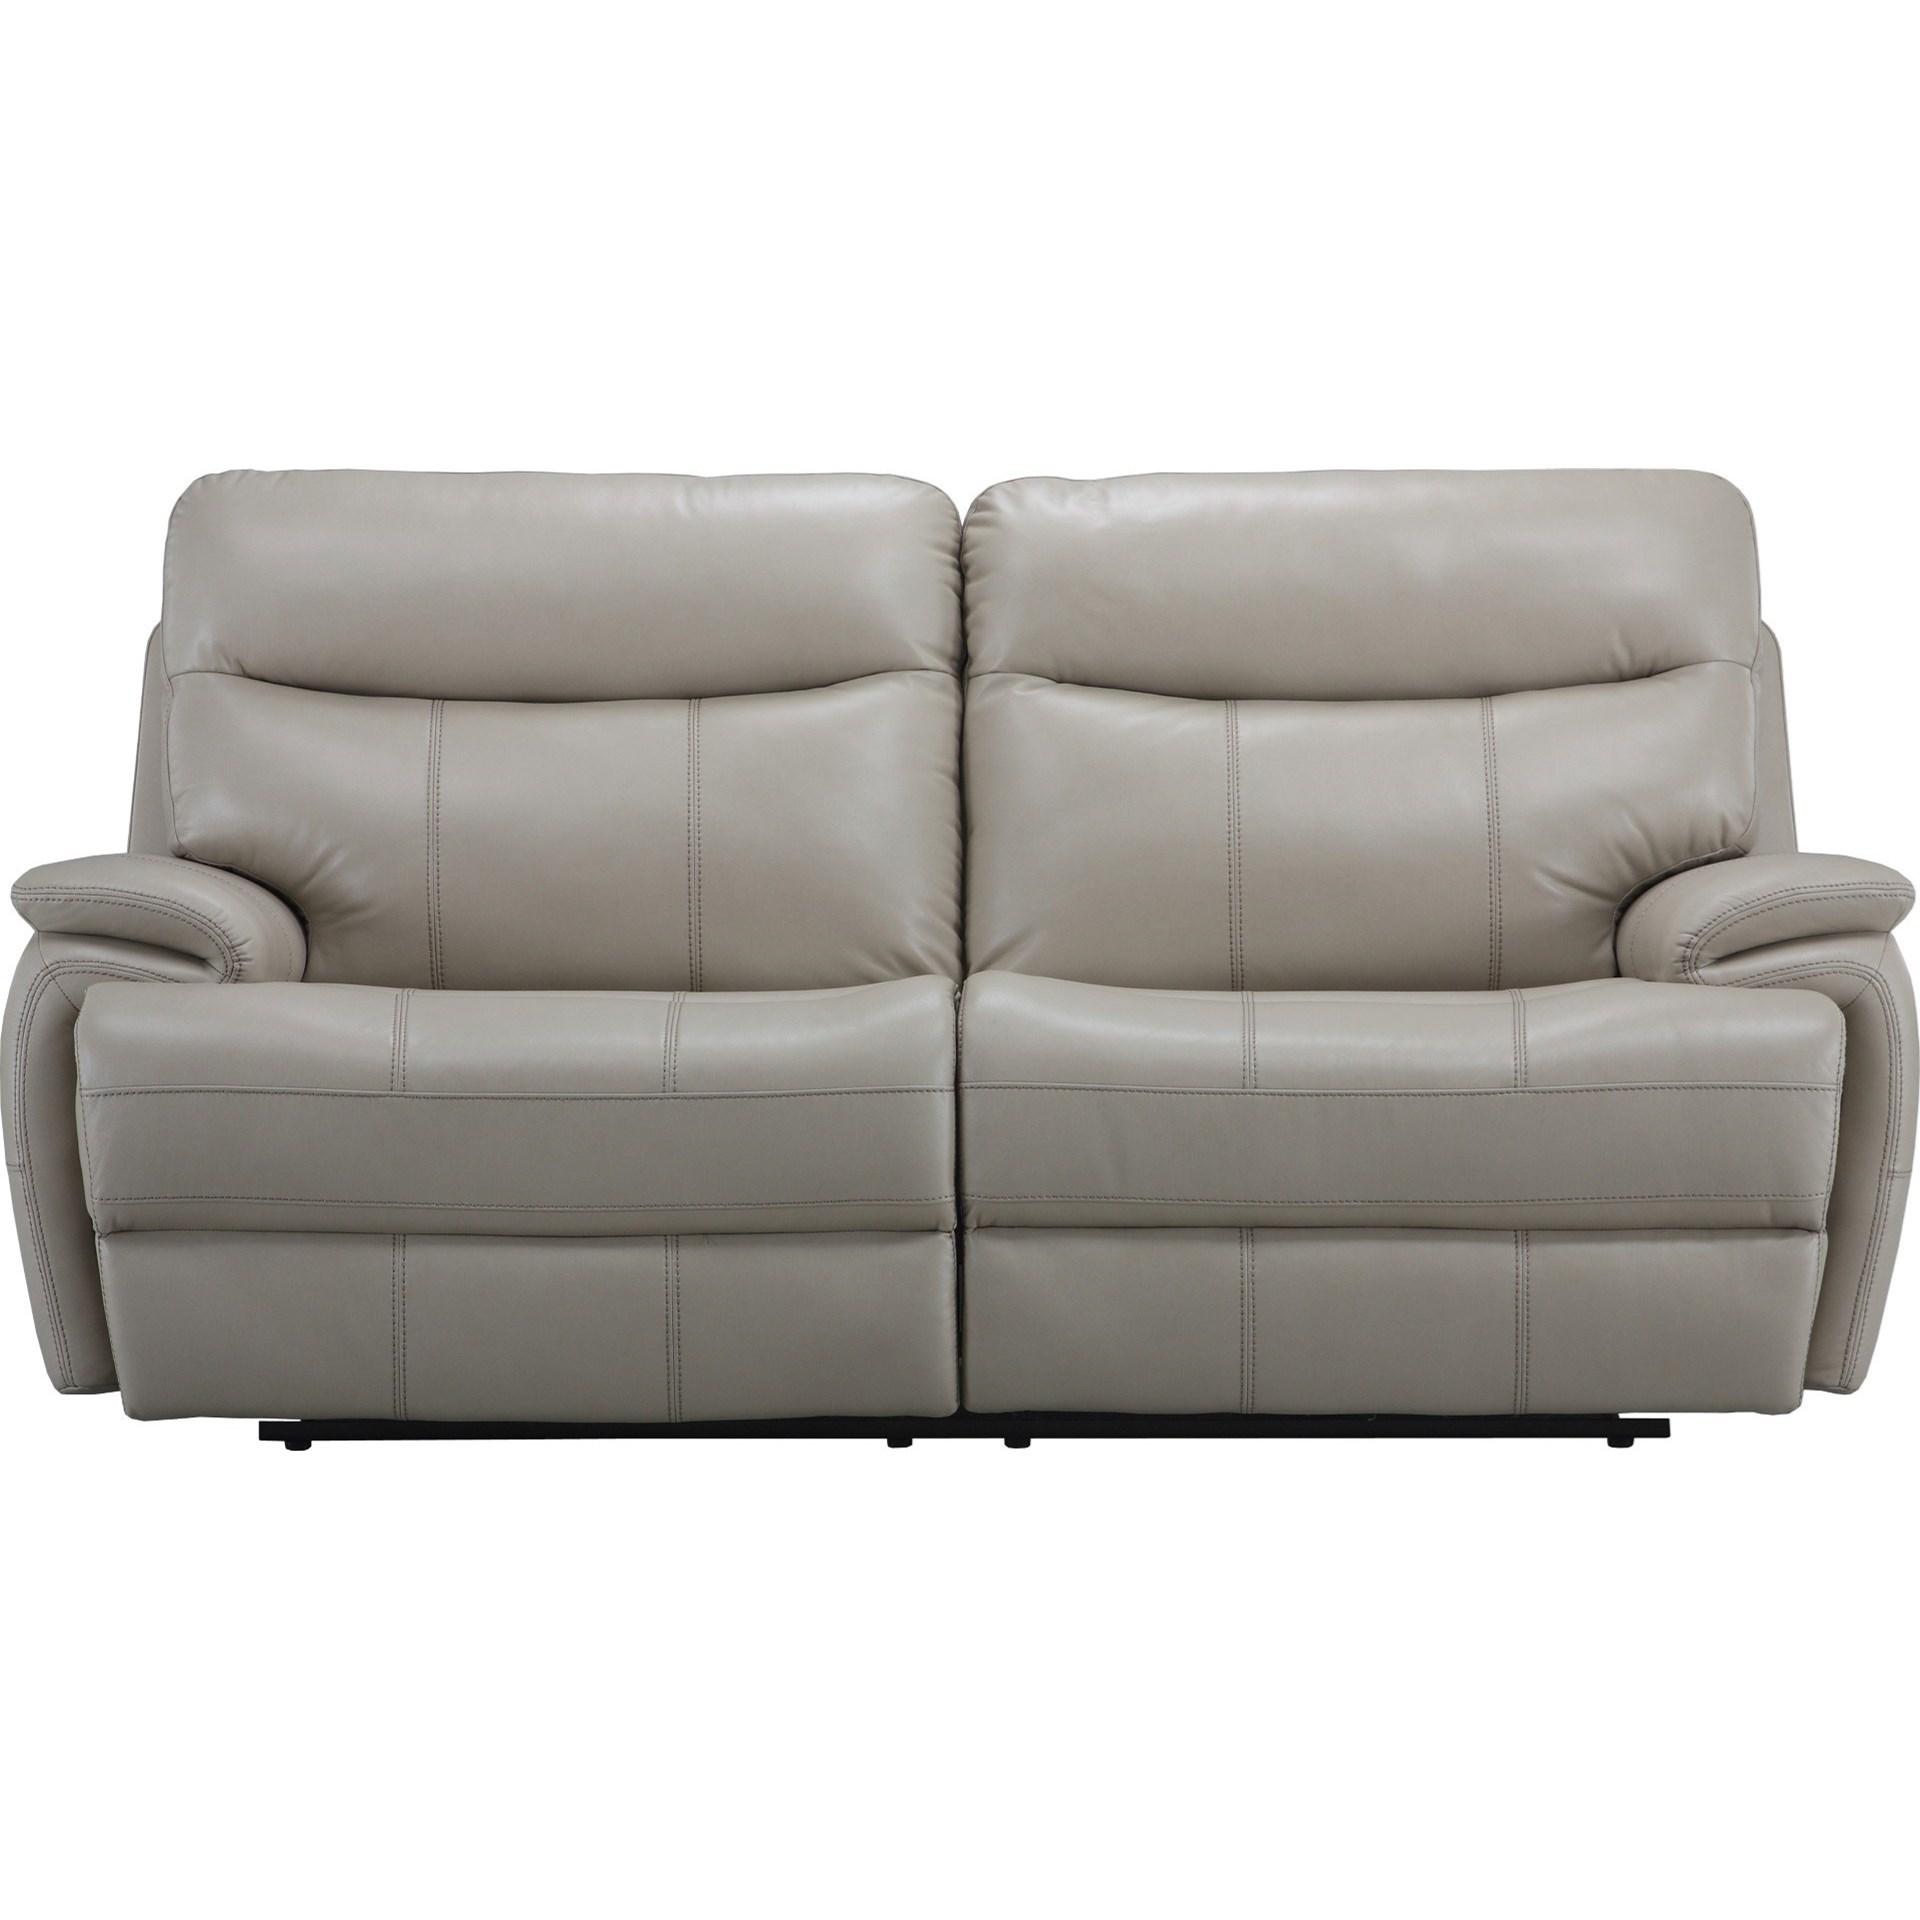 Parker Living DylanDual Reclining Two Cushion Sofa